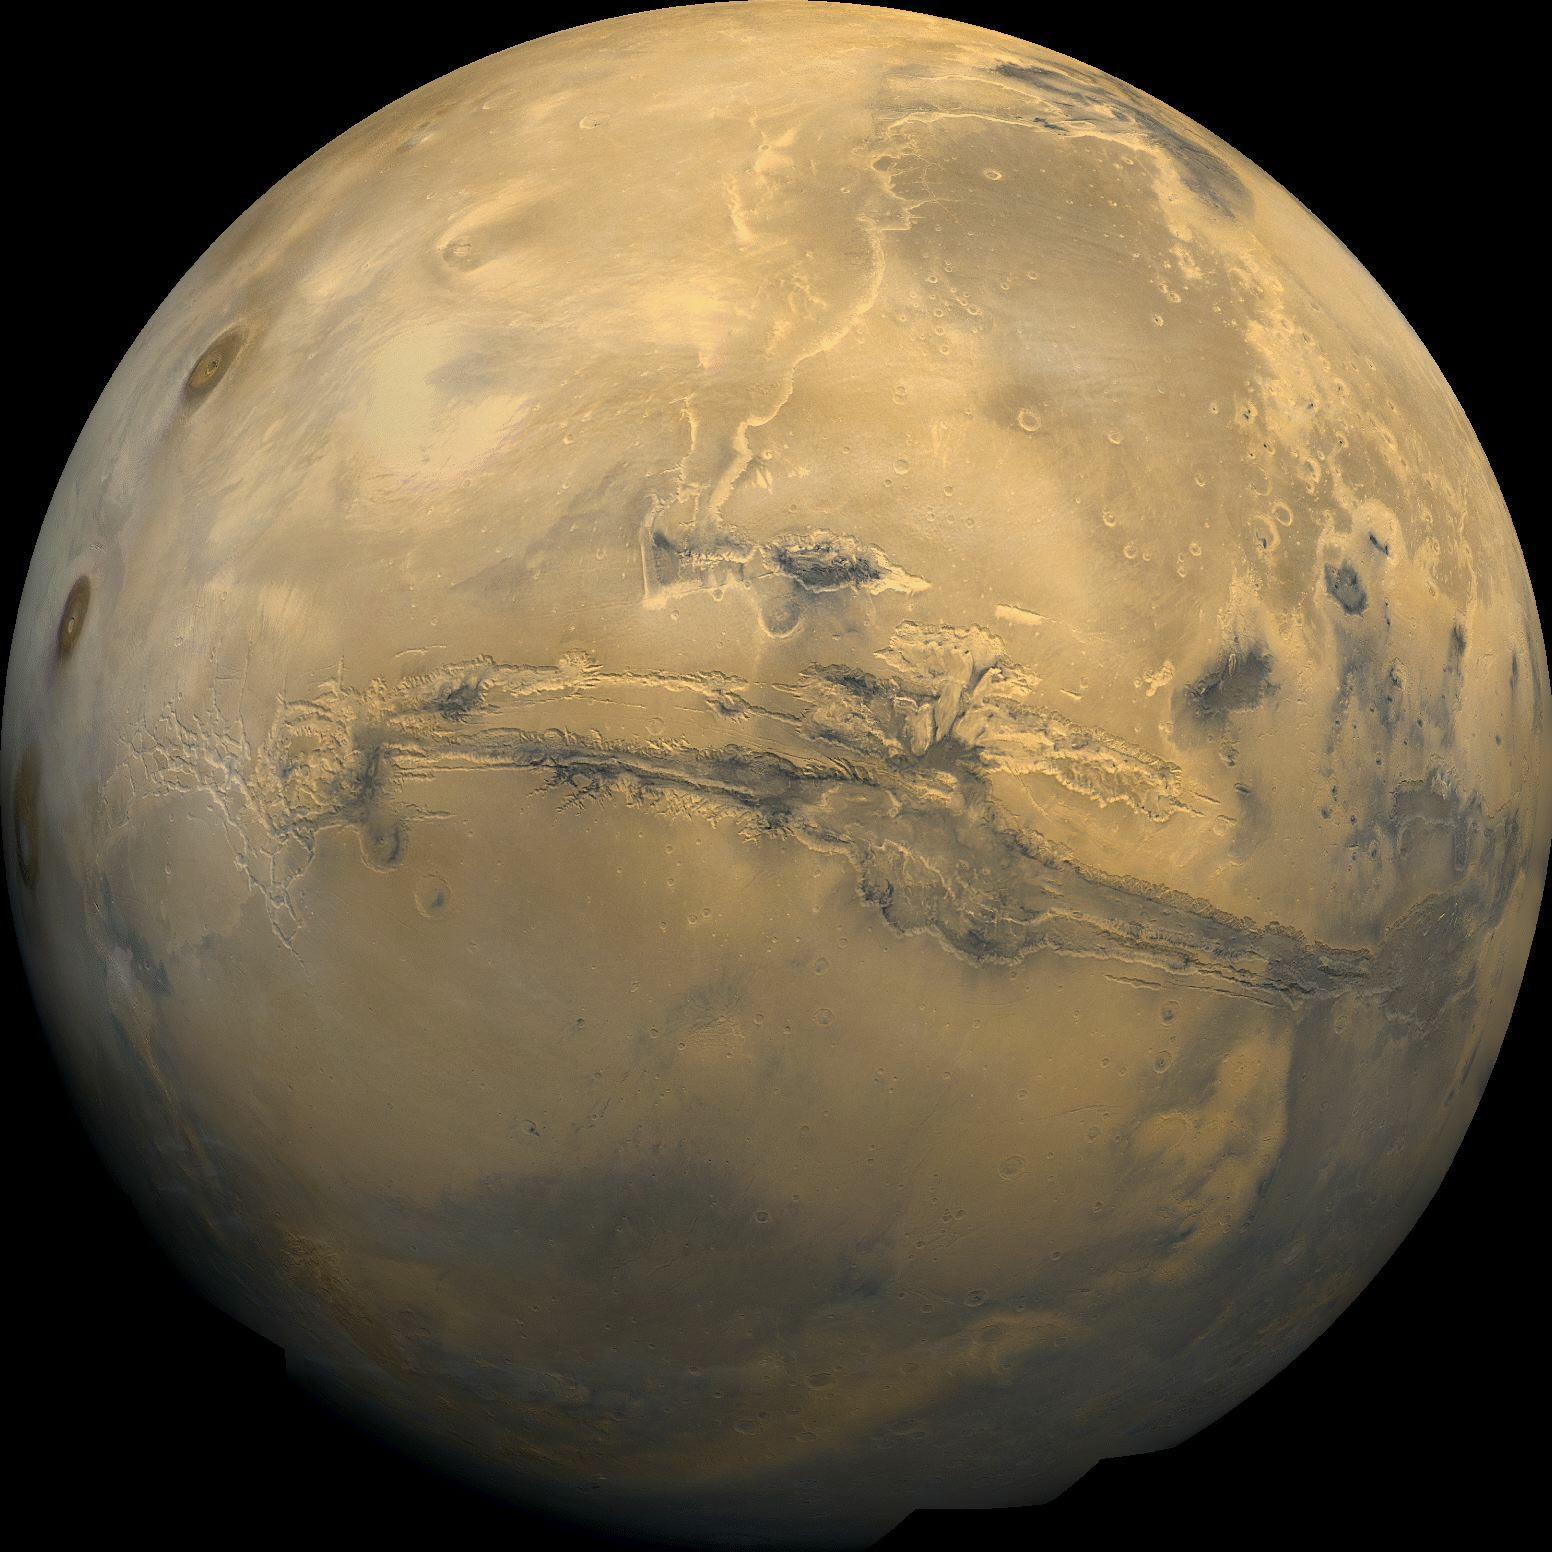 http://upload.wikimedia.org/wikipedia/commons/5/56/Mars_Valles_Marineris.jpeg